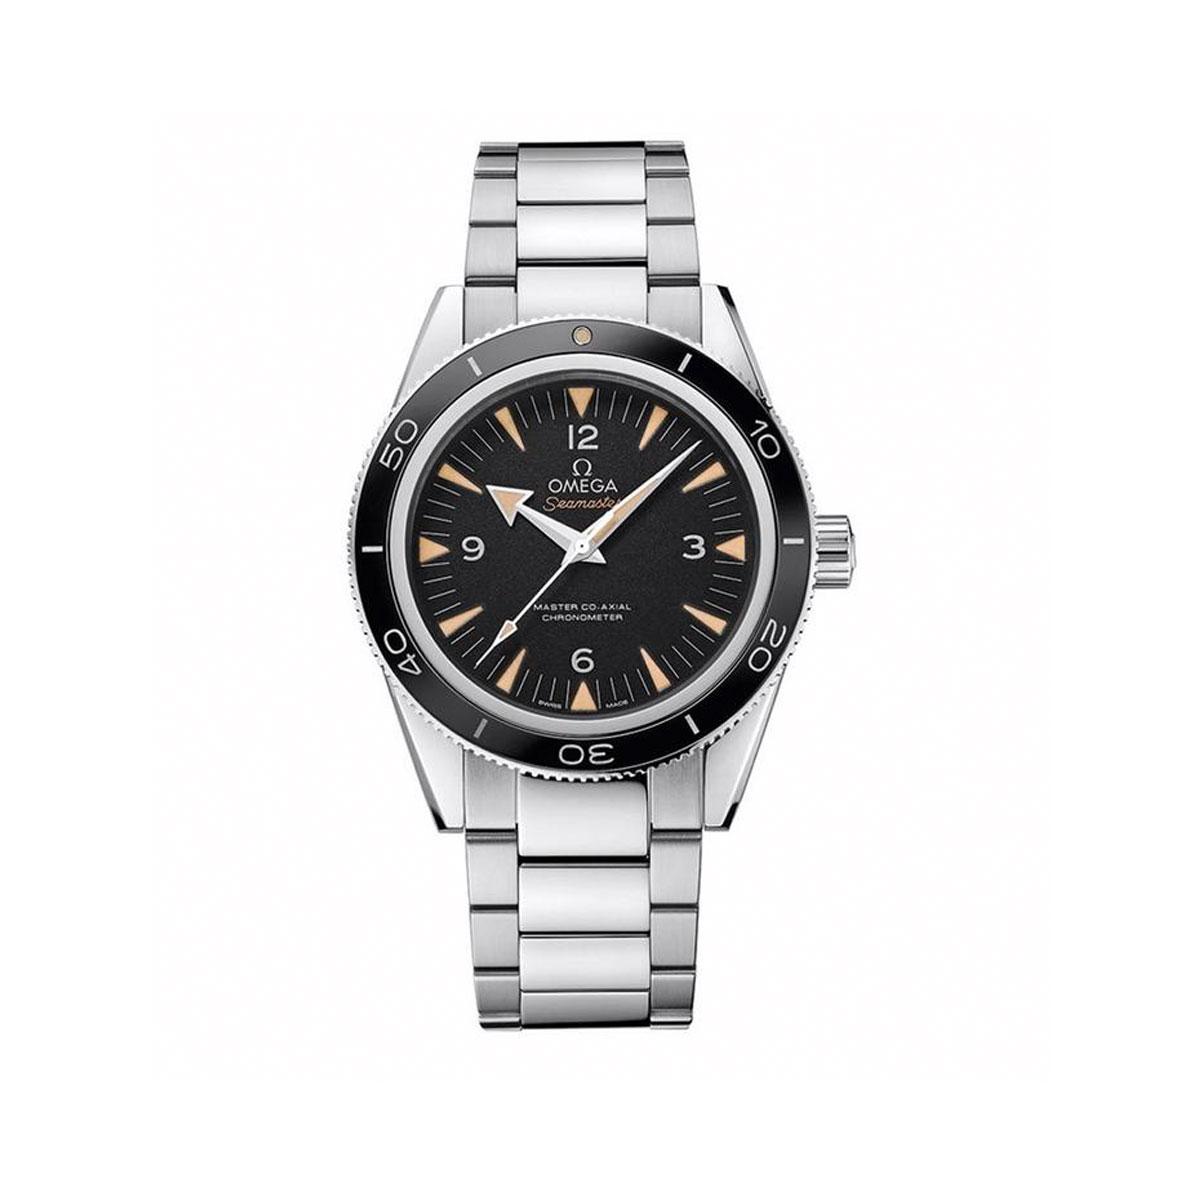 Omega 233.30.41.21.01.001 Seamaster Black Dial